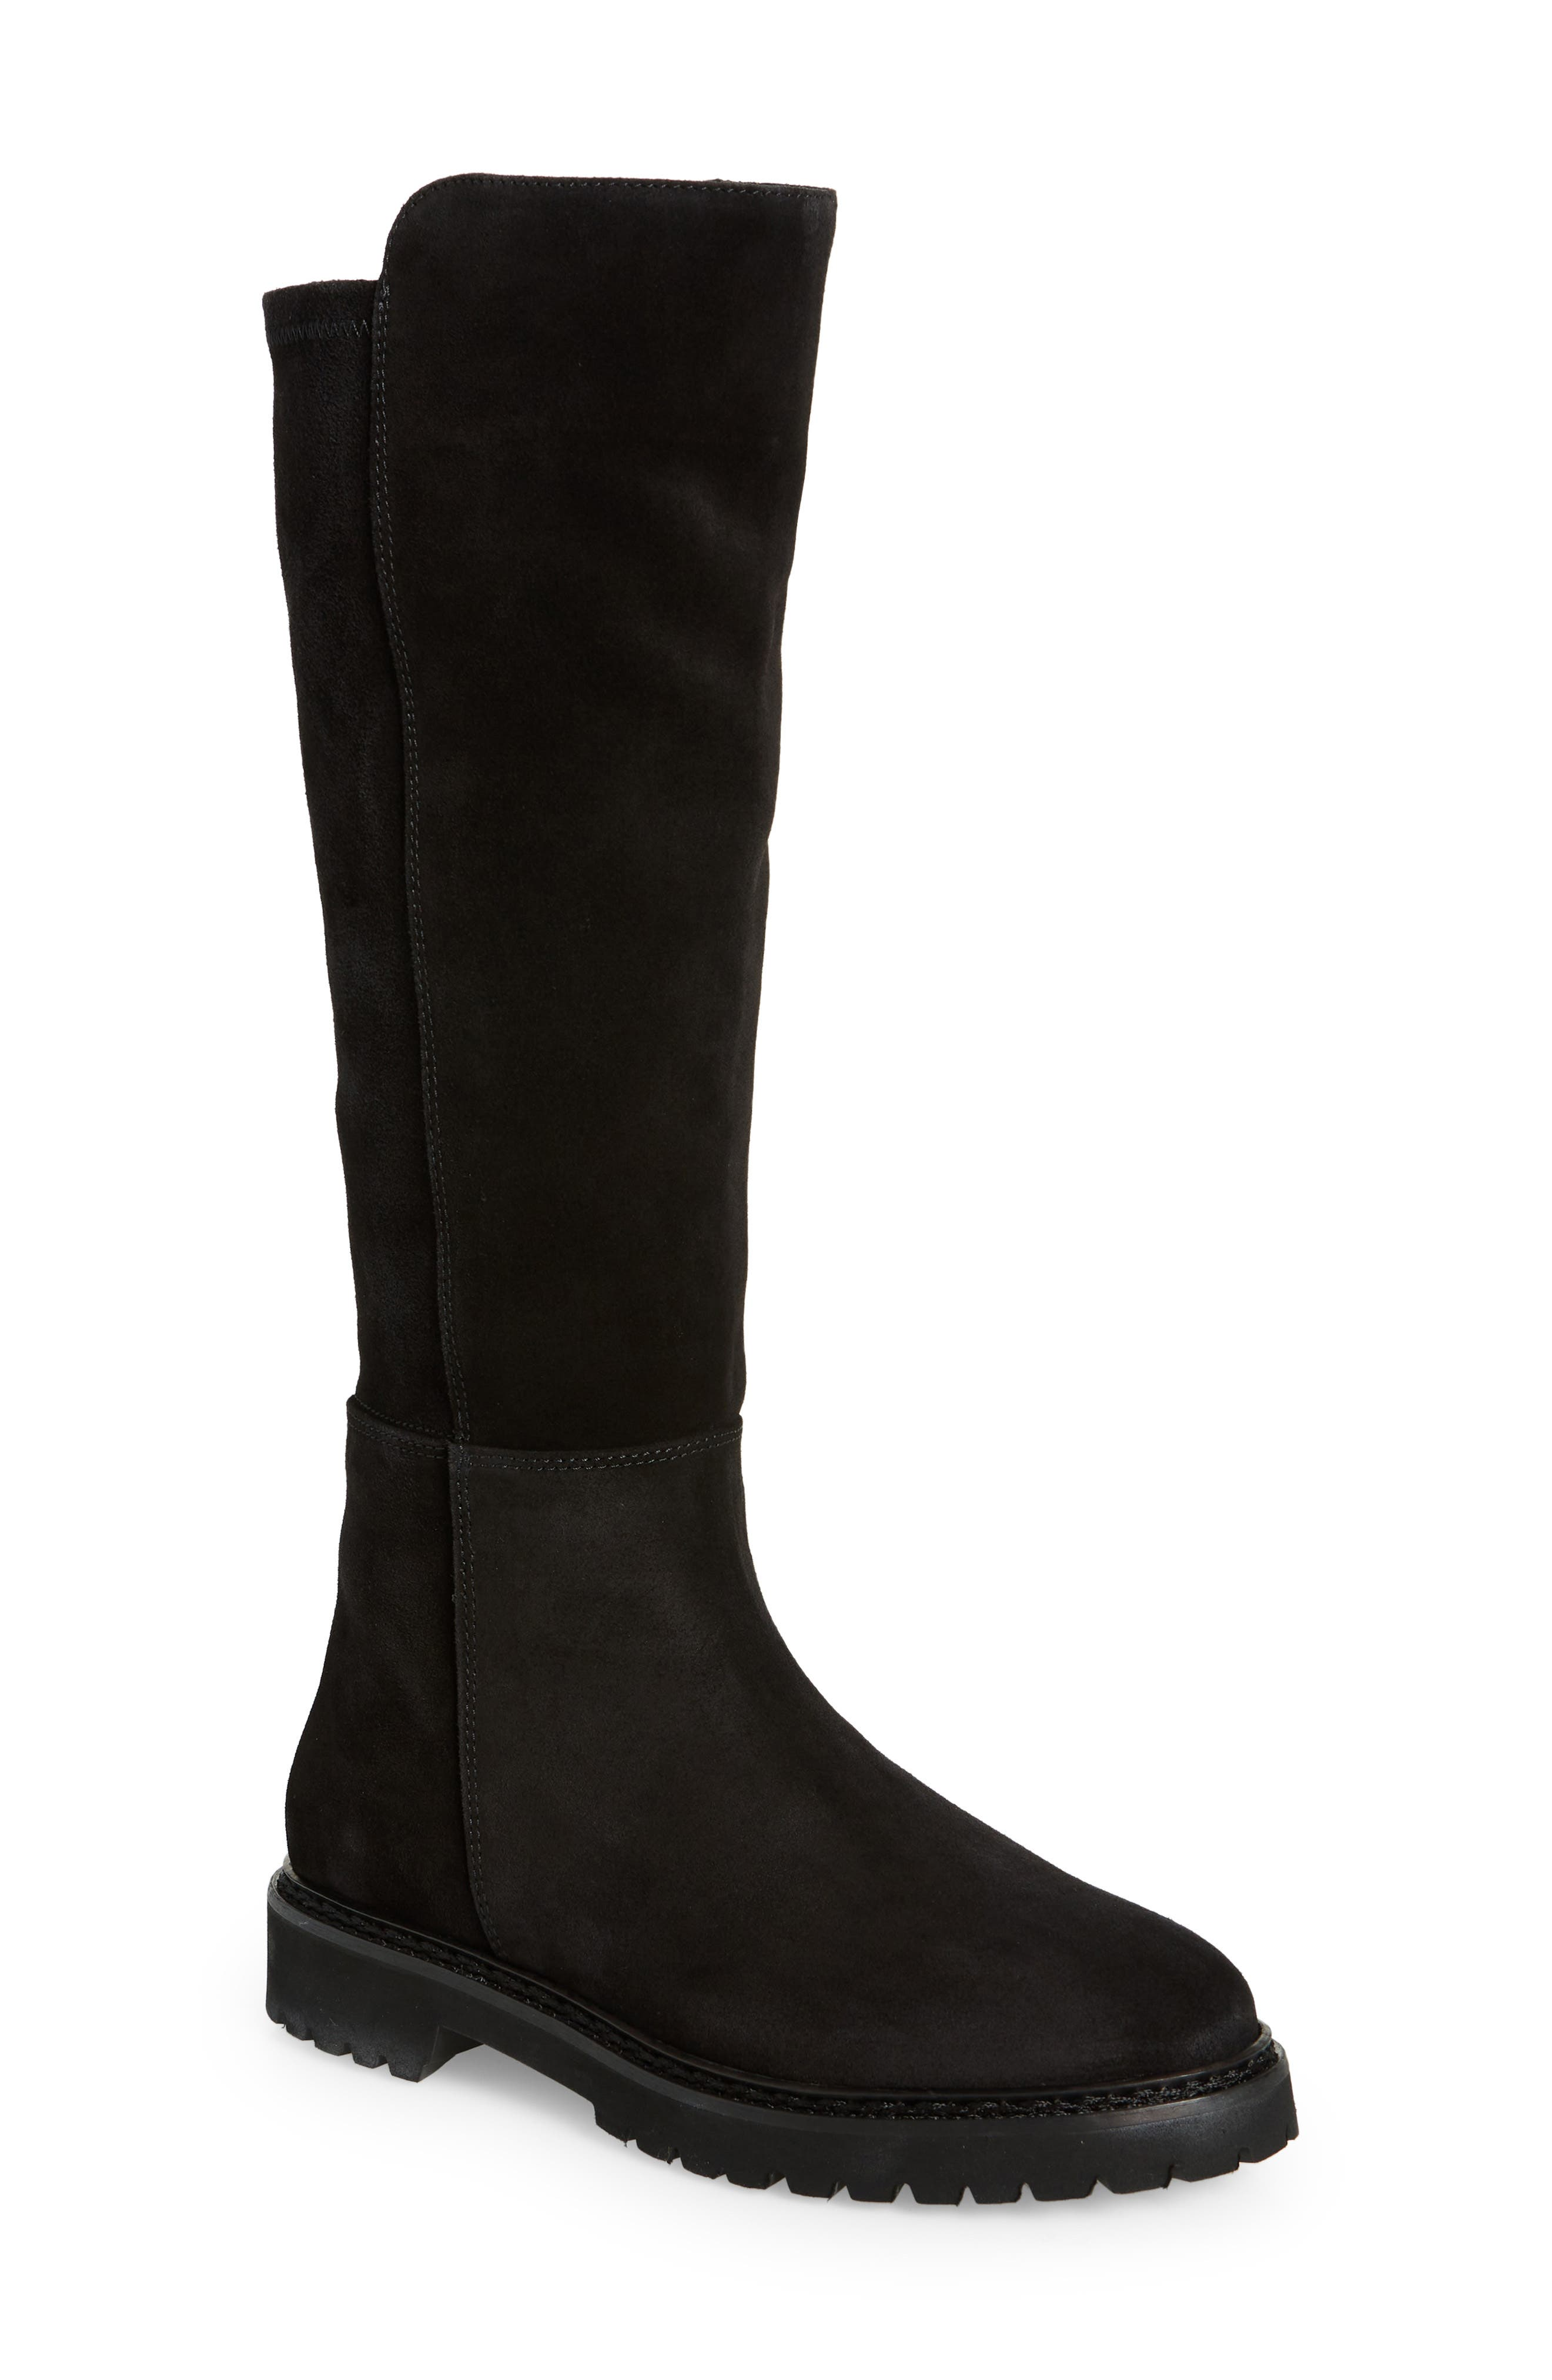 Mattie Tall Water Resistant Boot